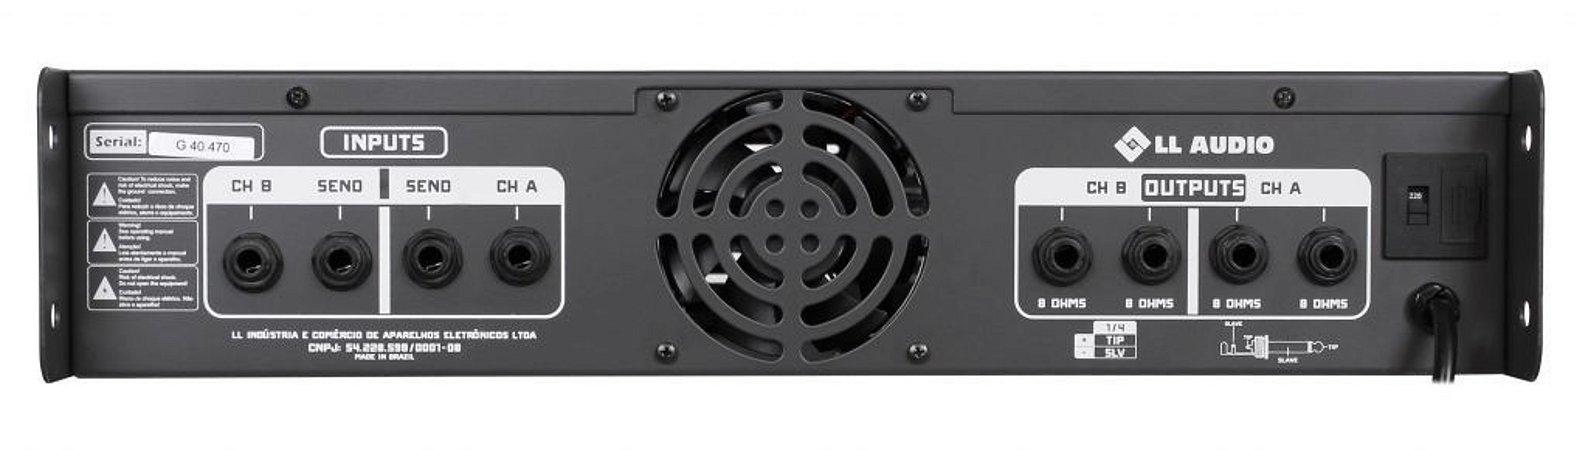 Amplificador de Potência Pro1200x